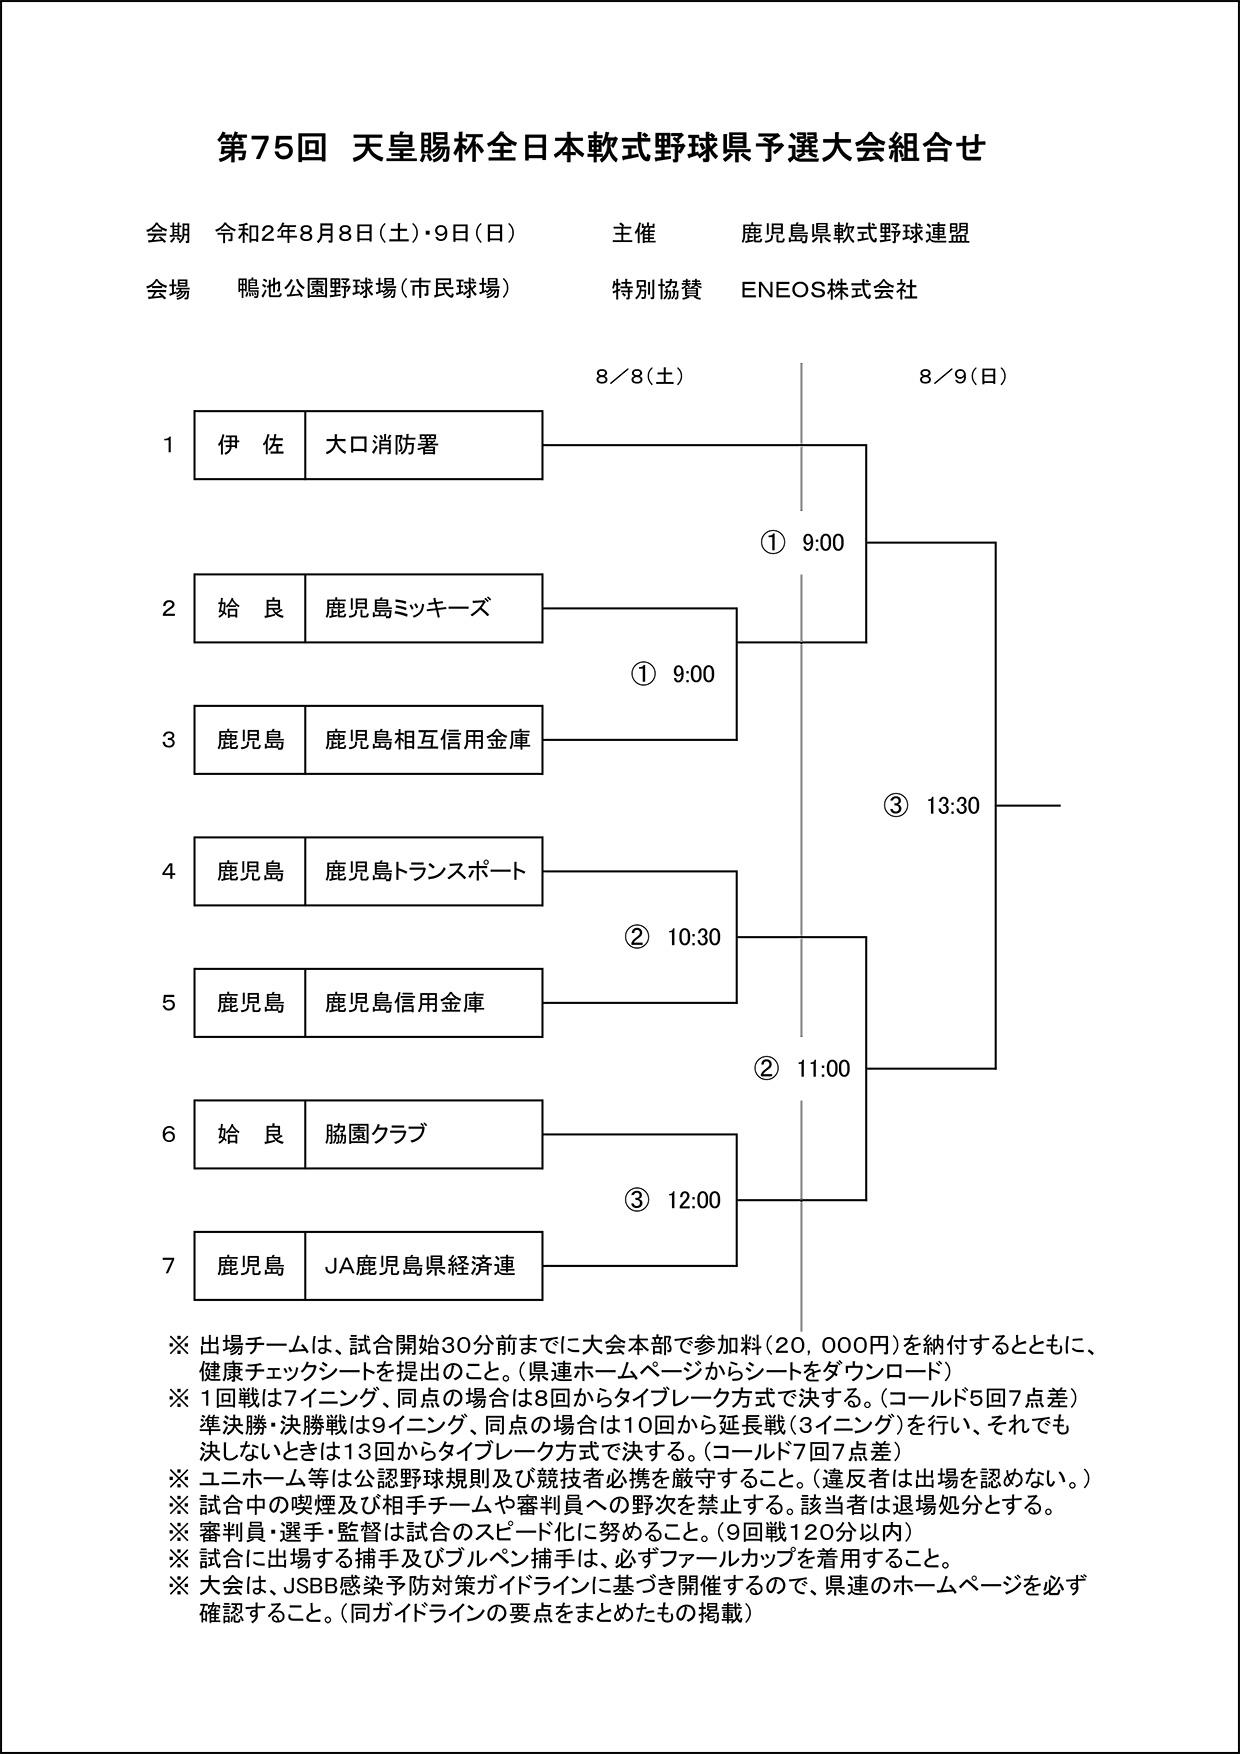 【組合せ】第75回天皇賜杯大会